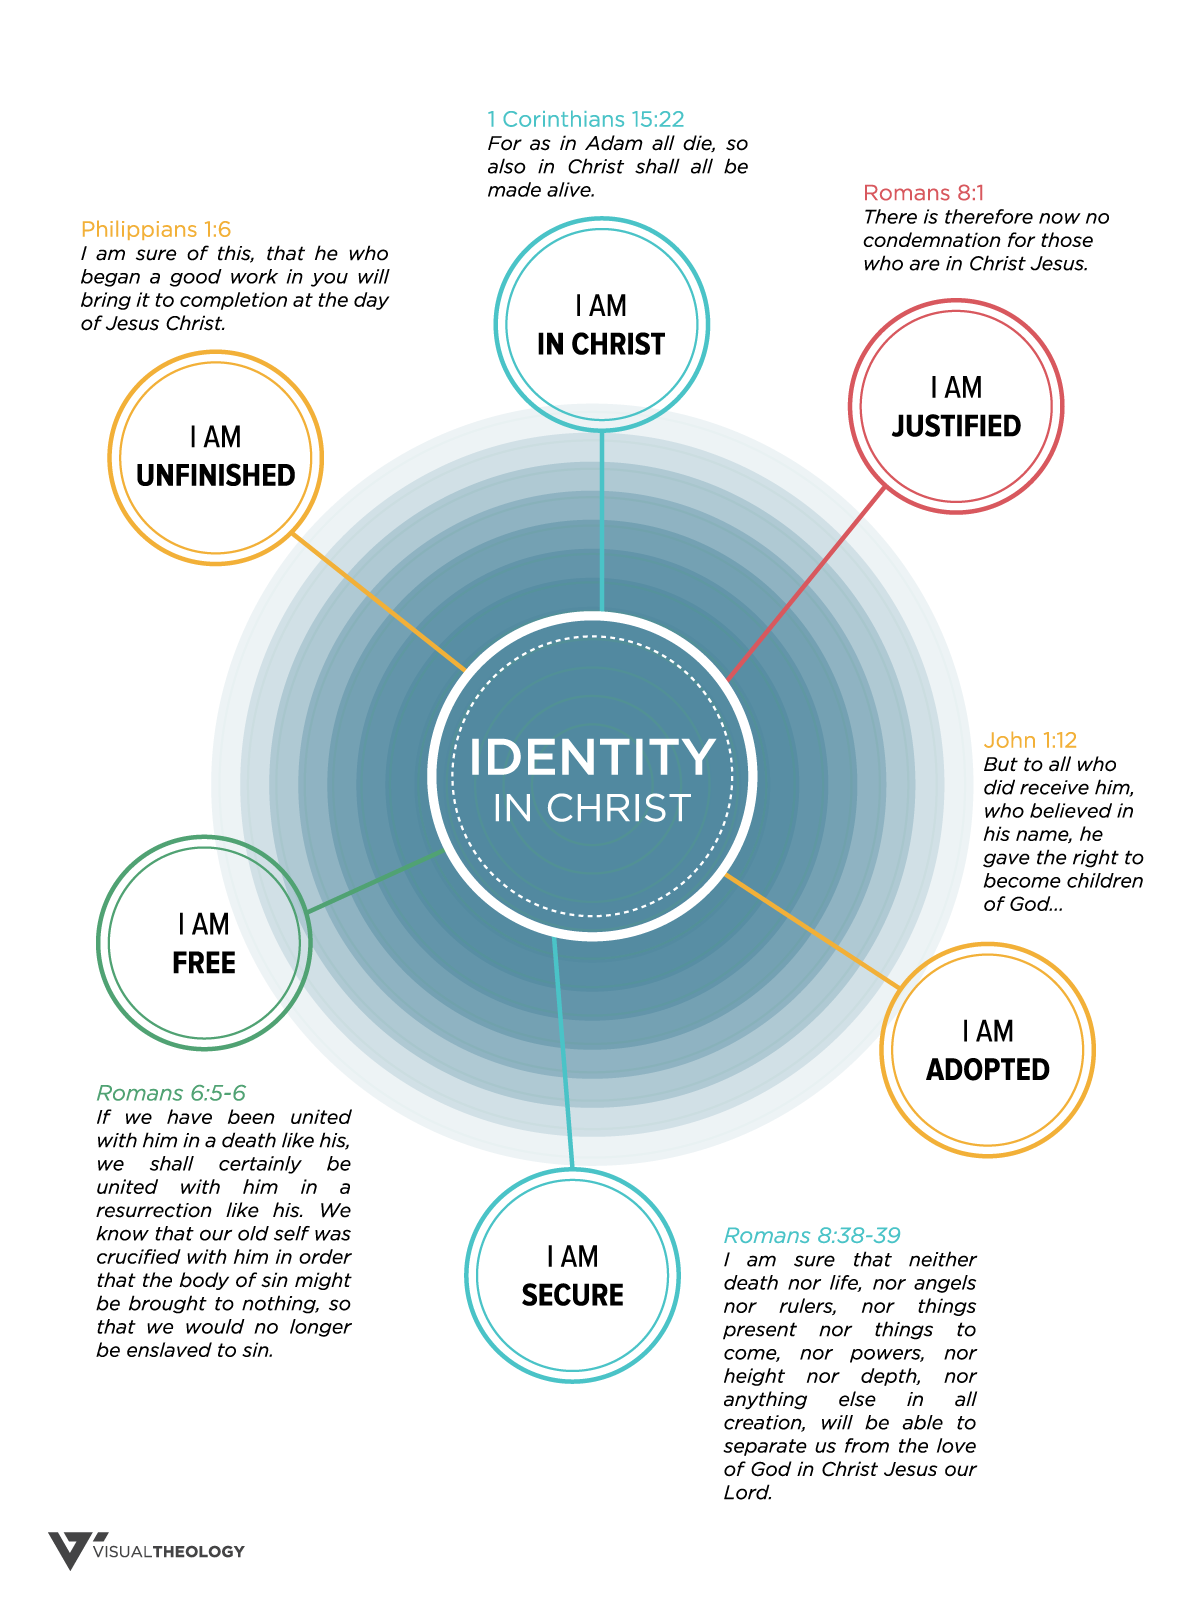 medium resolution of visual theology identity in christ 1200 1600